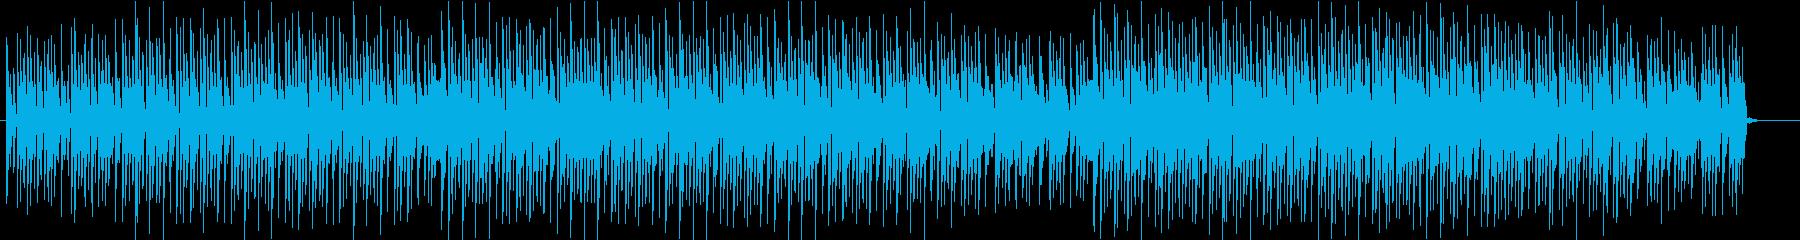 CMソングのようなダンスBGMの再生済みの波形